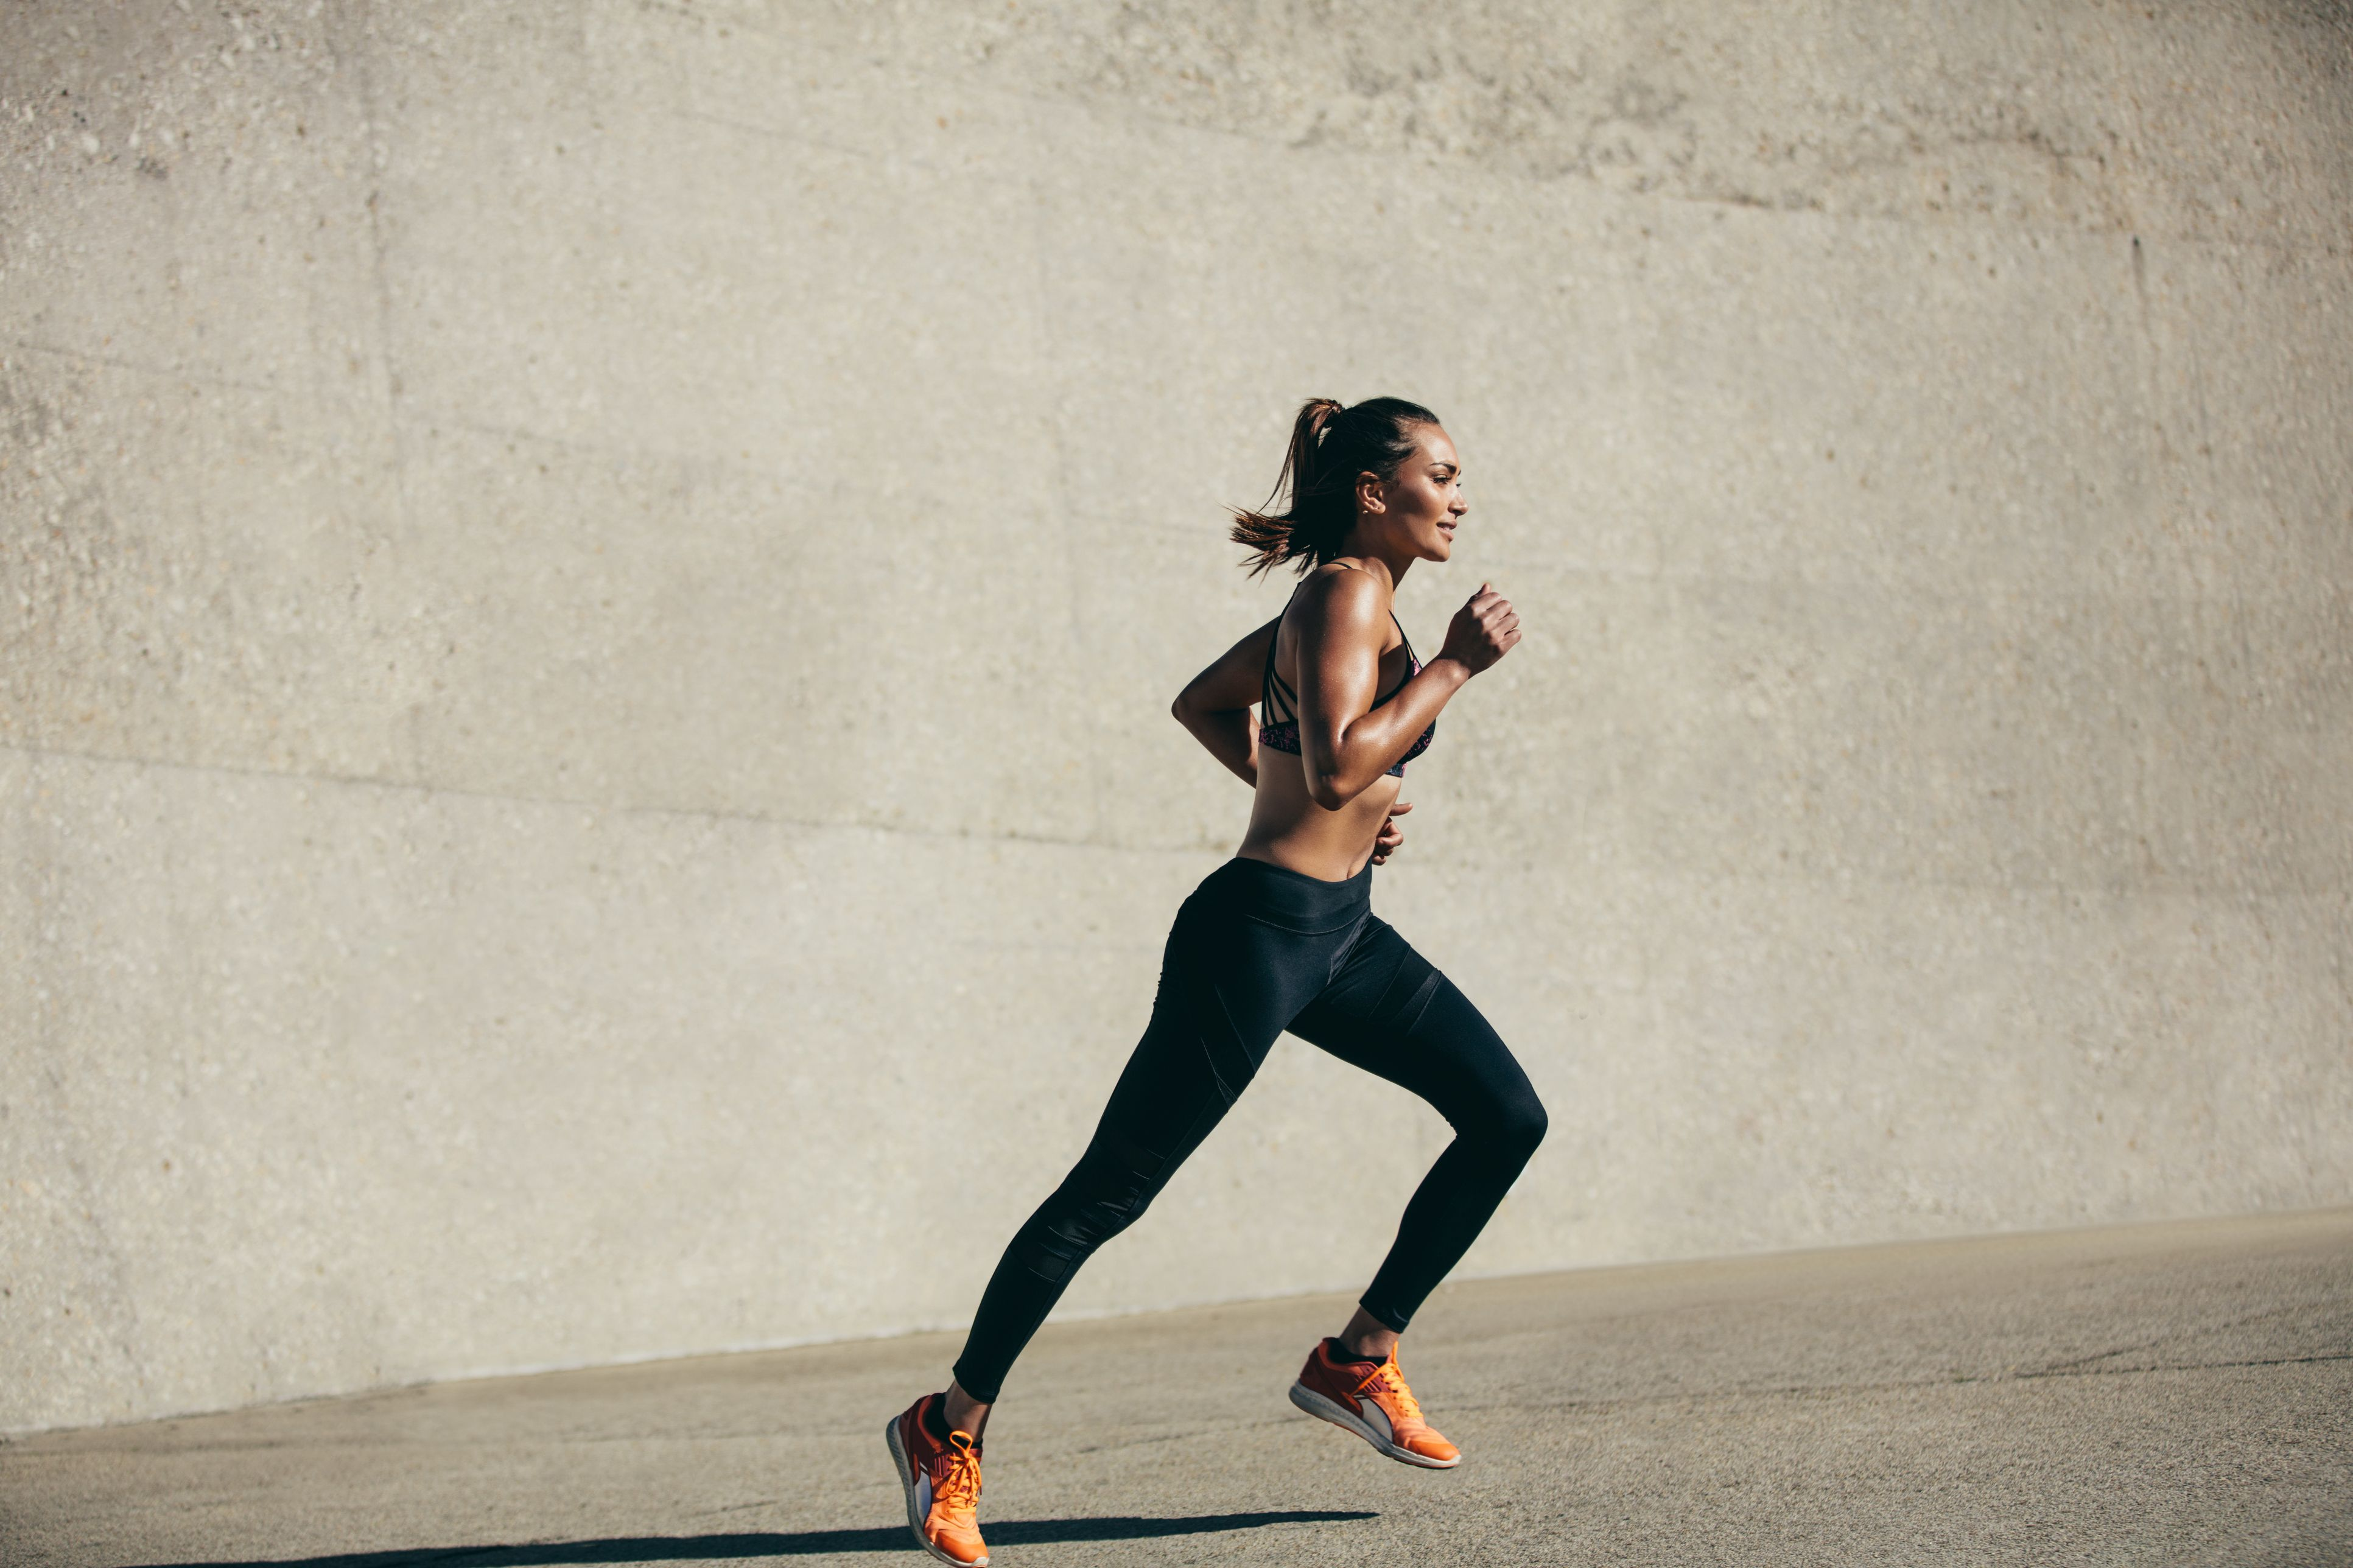 Proper Running Form How To Run